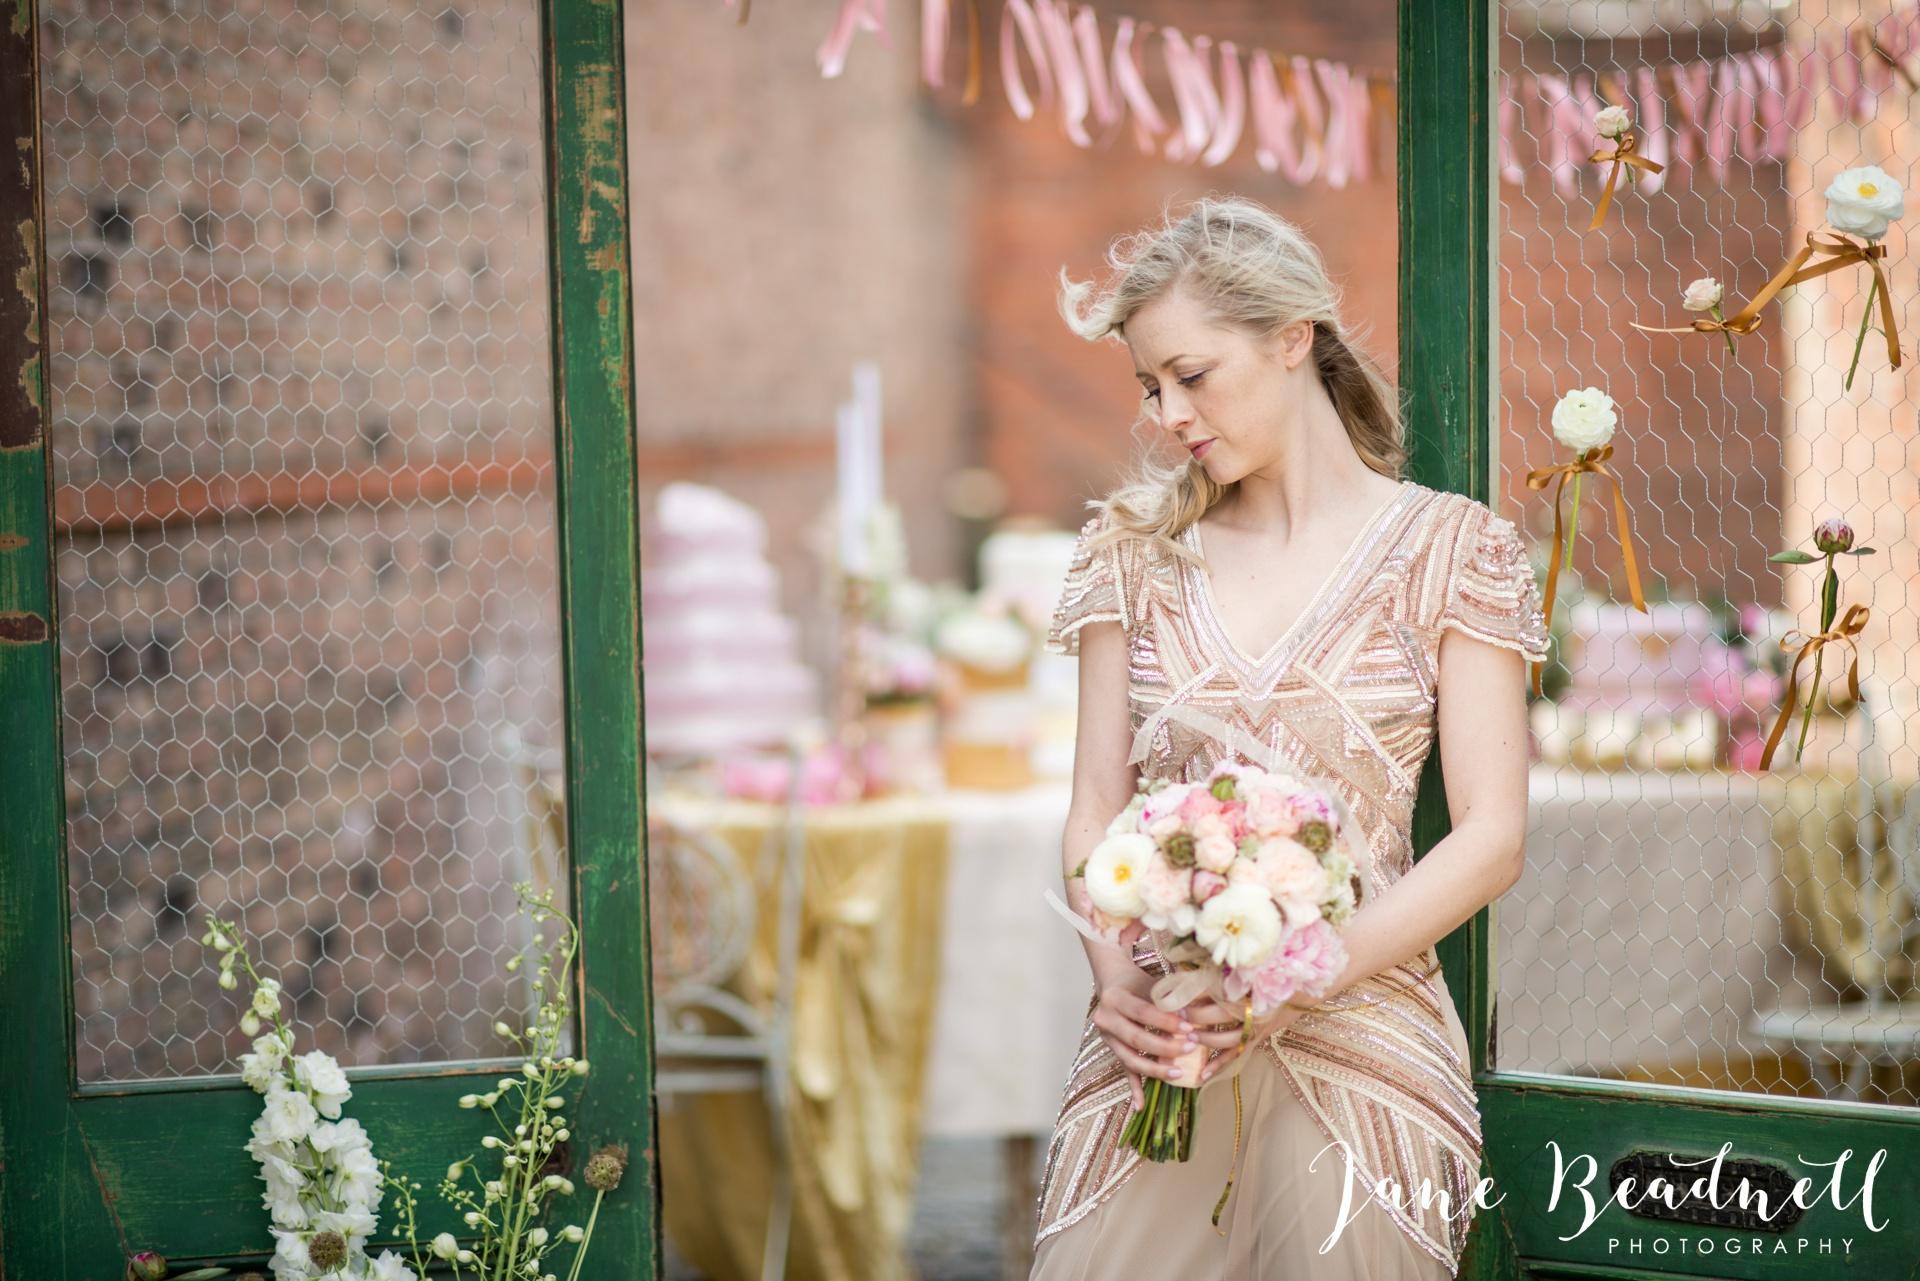 Jane Beadnell fine art wedding photographer York Bridal Photo Shoot_0018